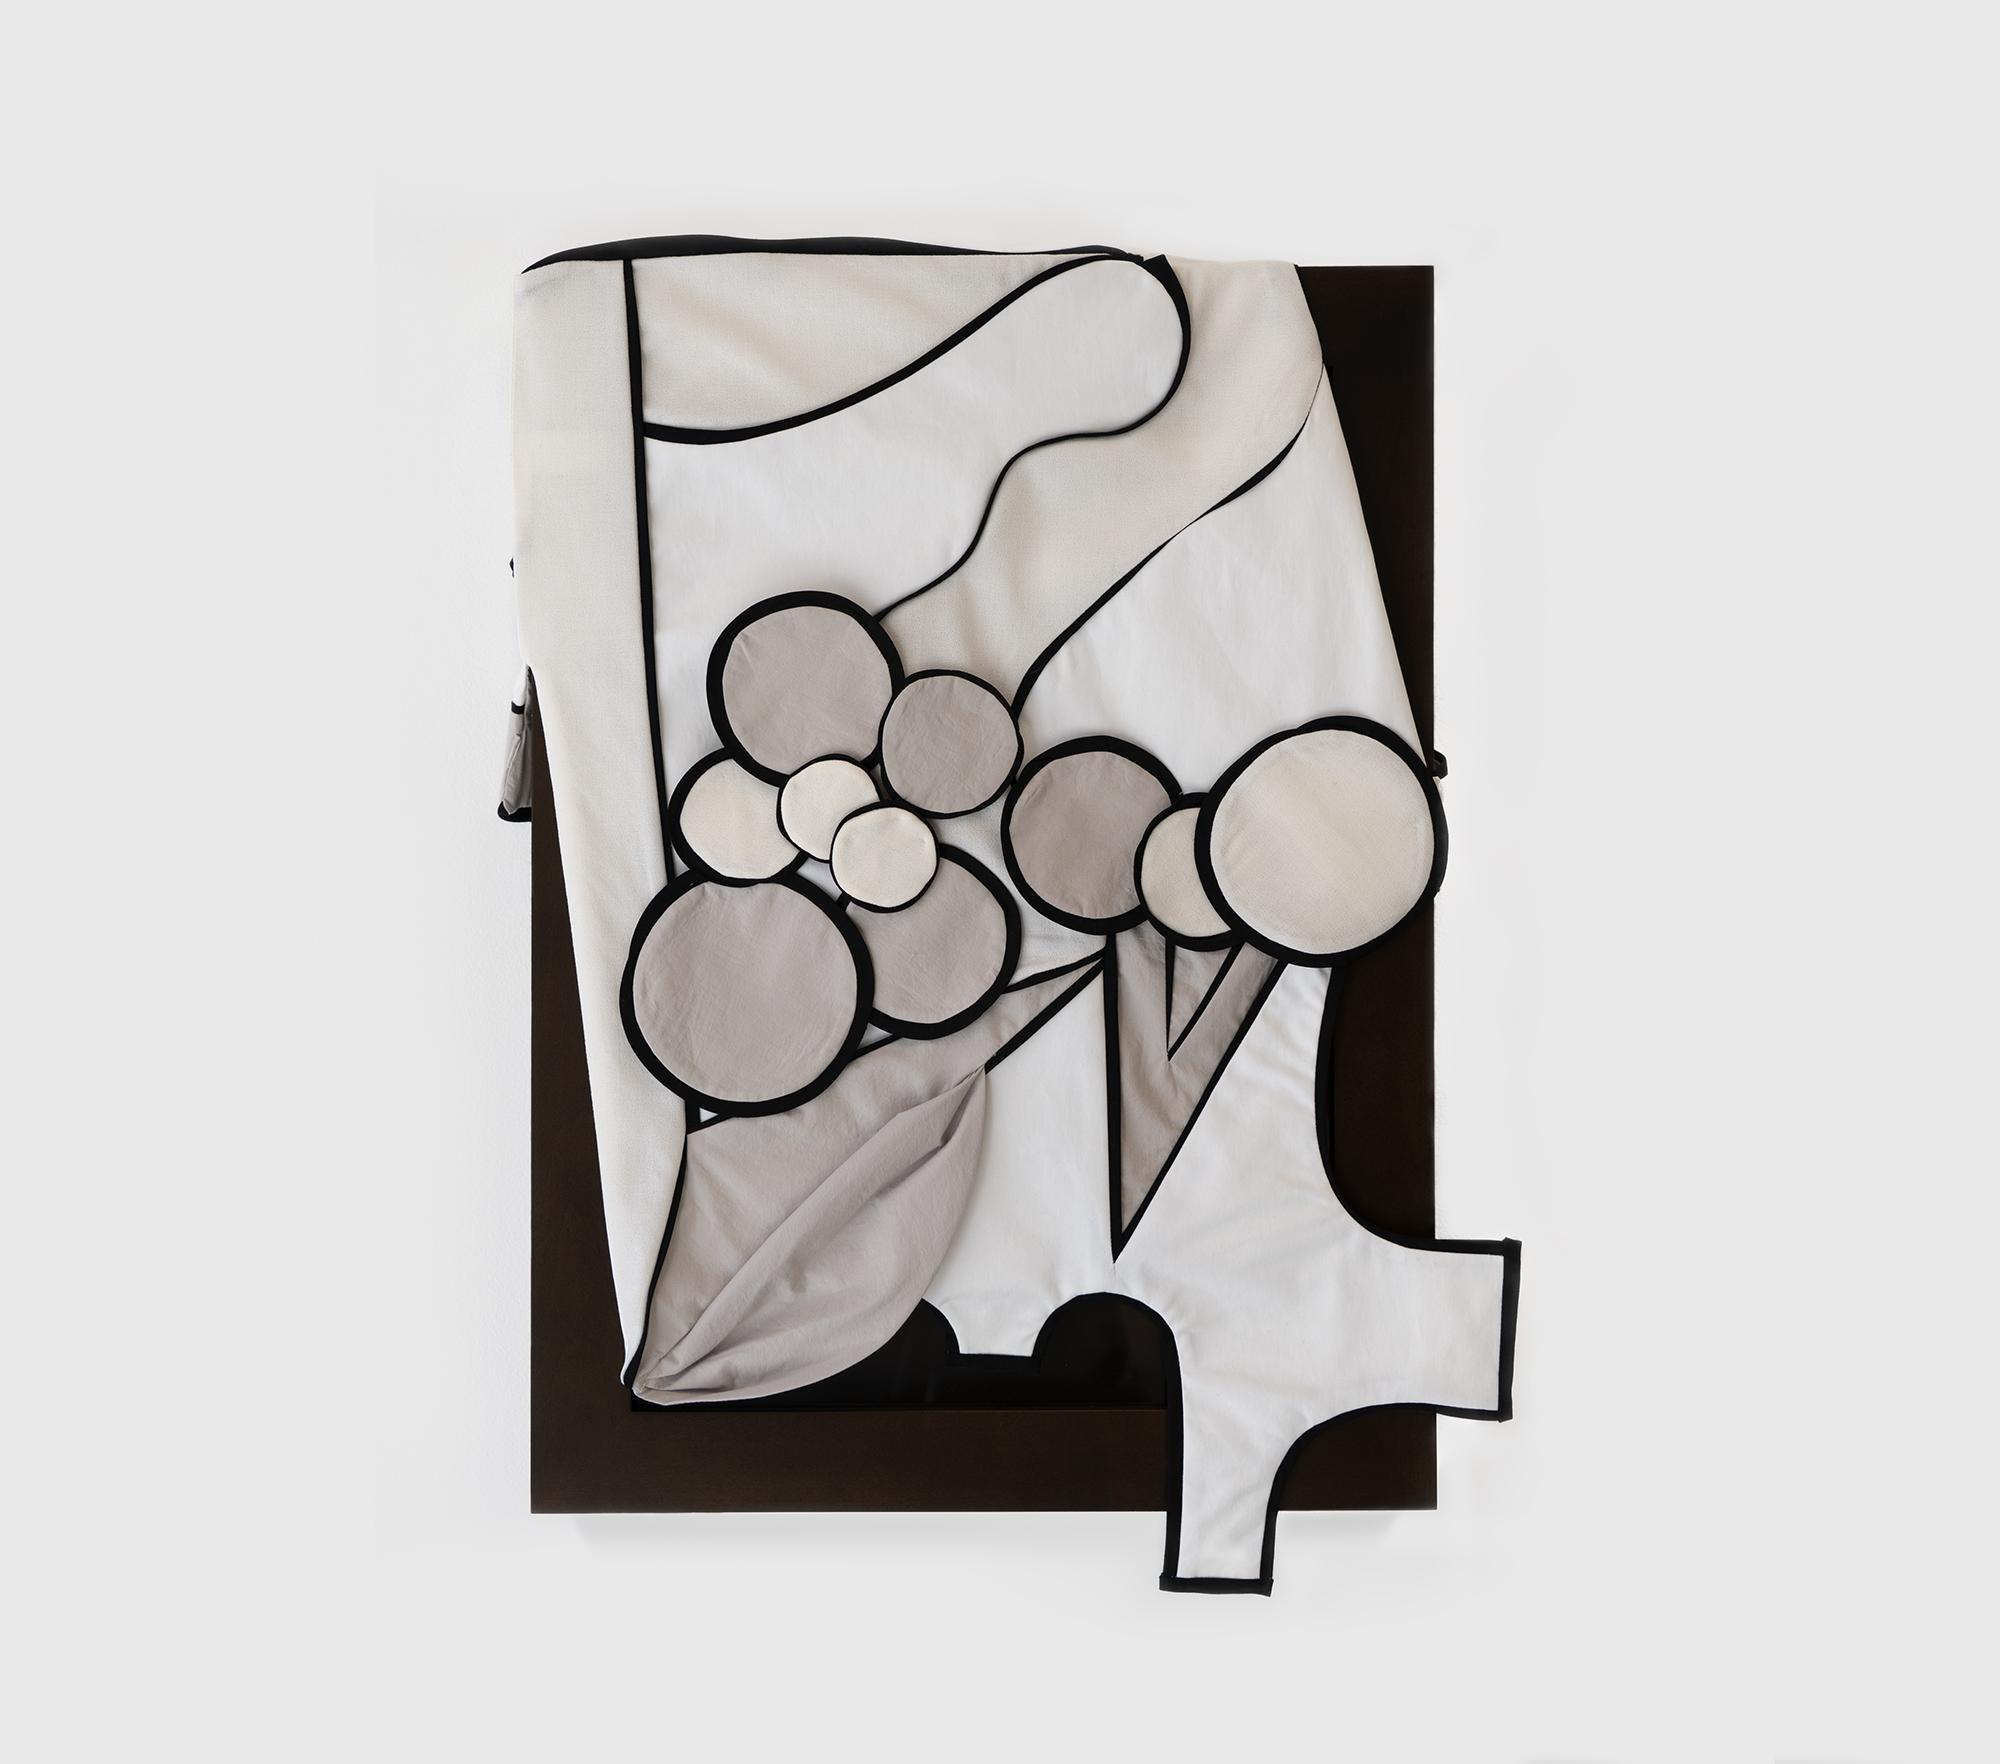 Laura Lima Zuzu 2019 Fabric, thread, wood, glass,...